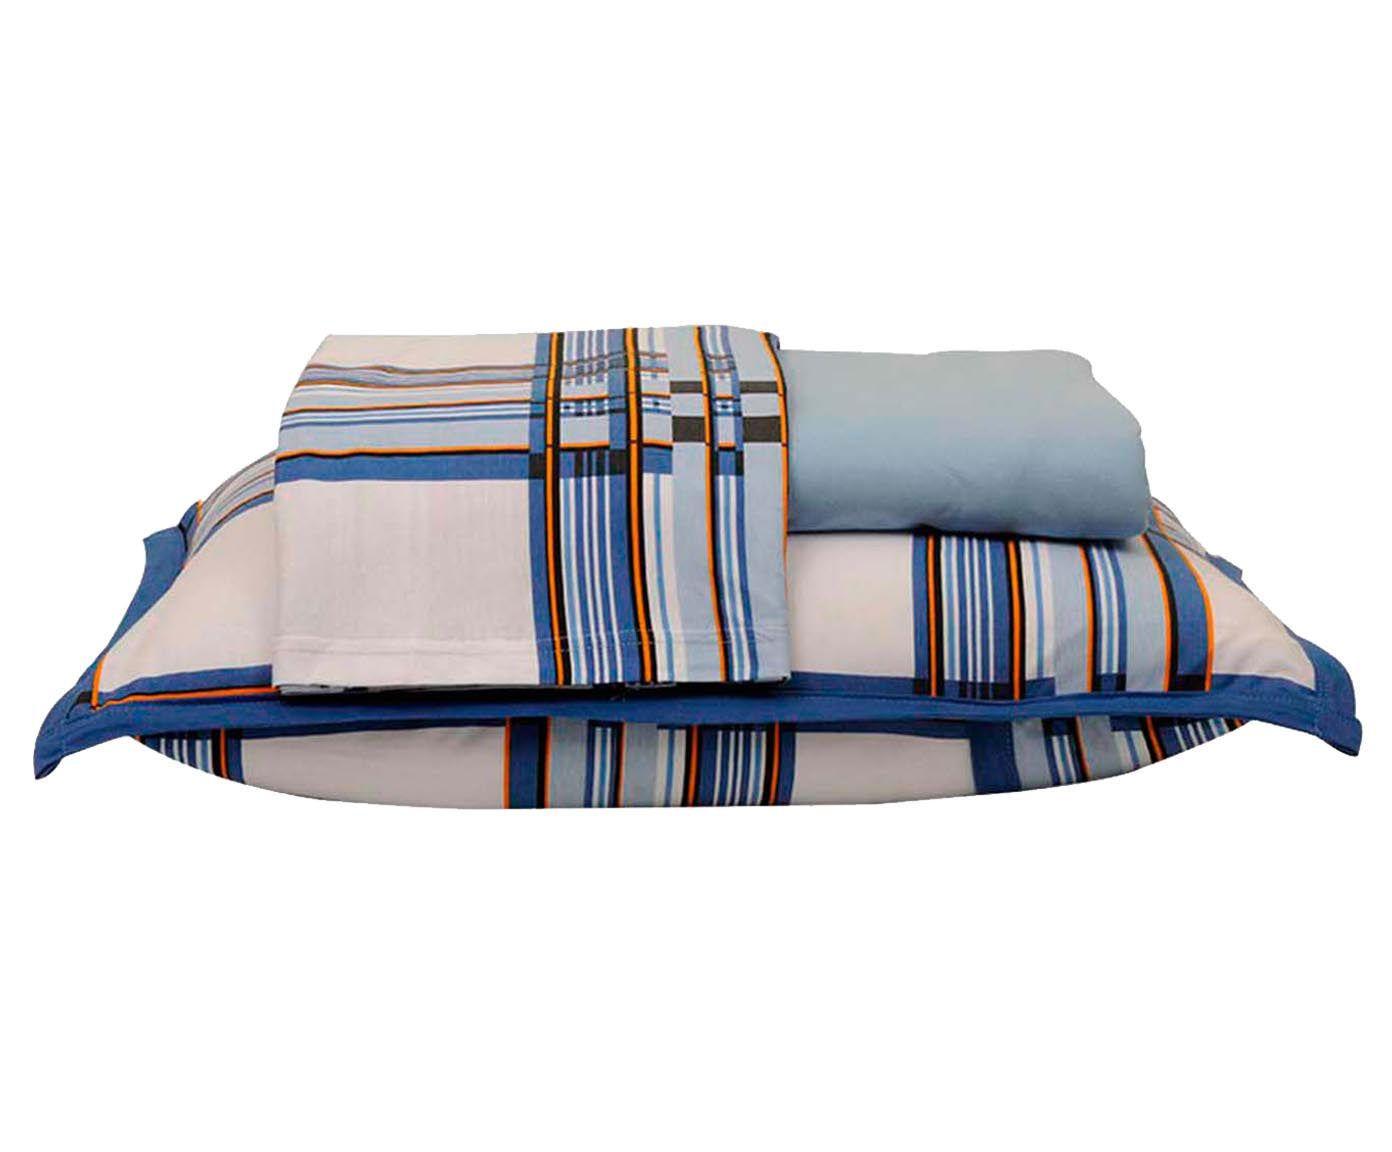 Jogo de lençol bed men - para cama queen size | Westwing.com.br